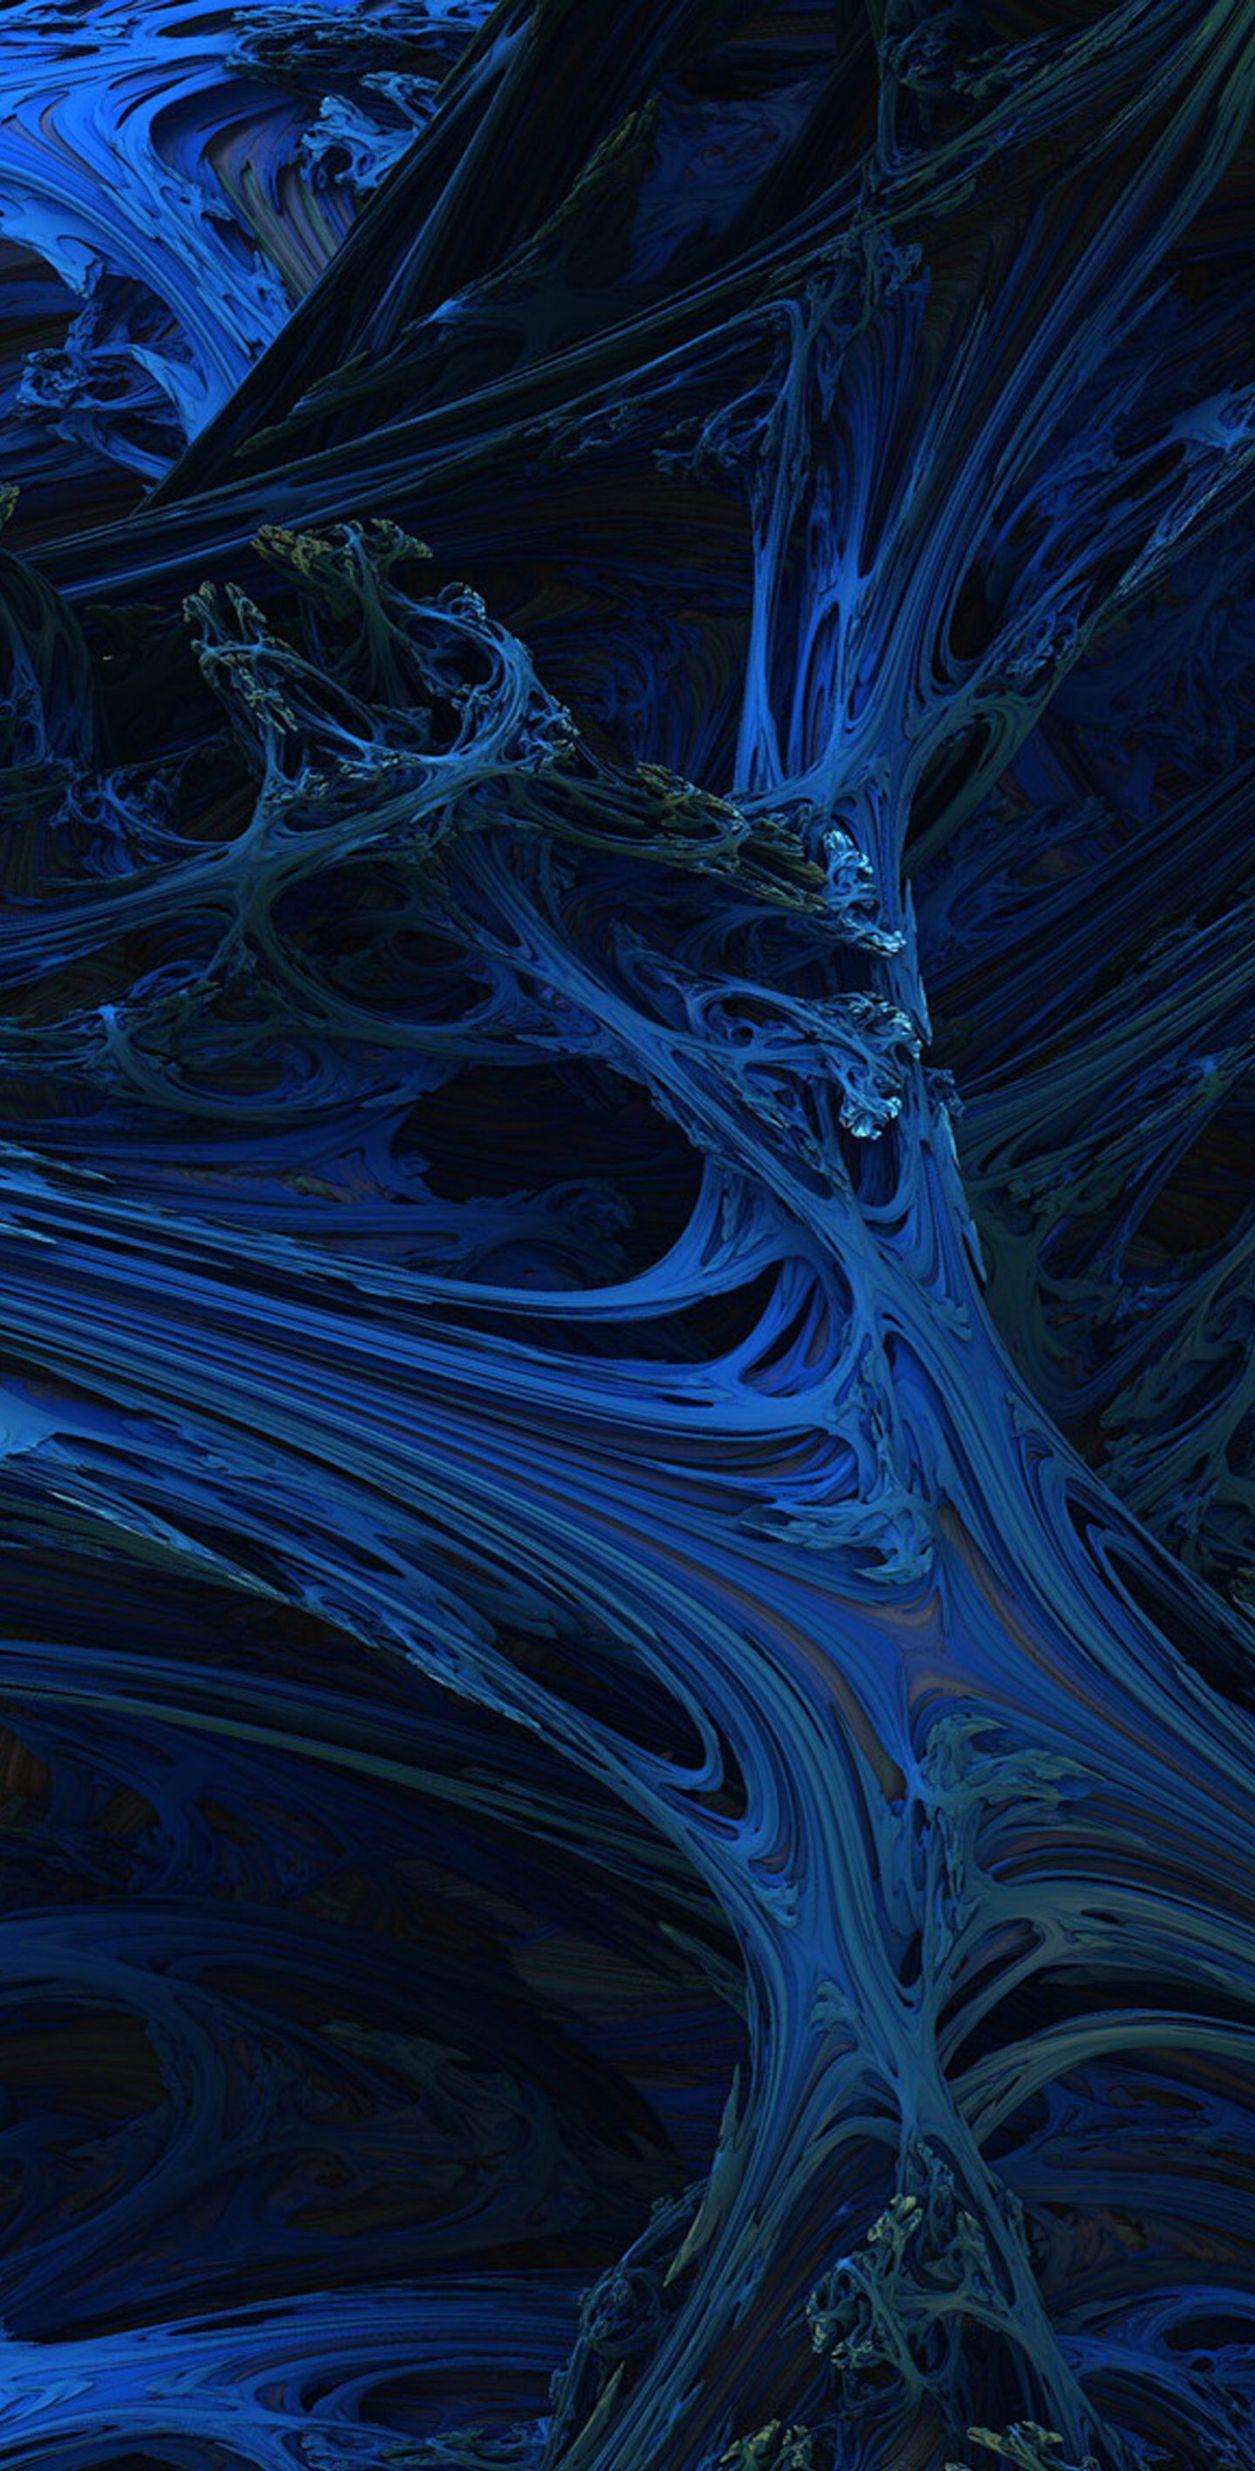 Ga galaxy s8 wallpaper stock - Dark Blue Wallpaper Pattern Galaxy Colour Abstract Digital Art